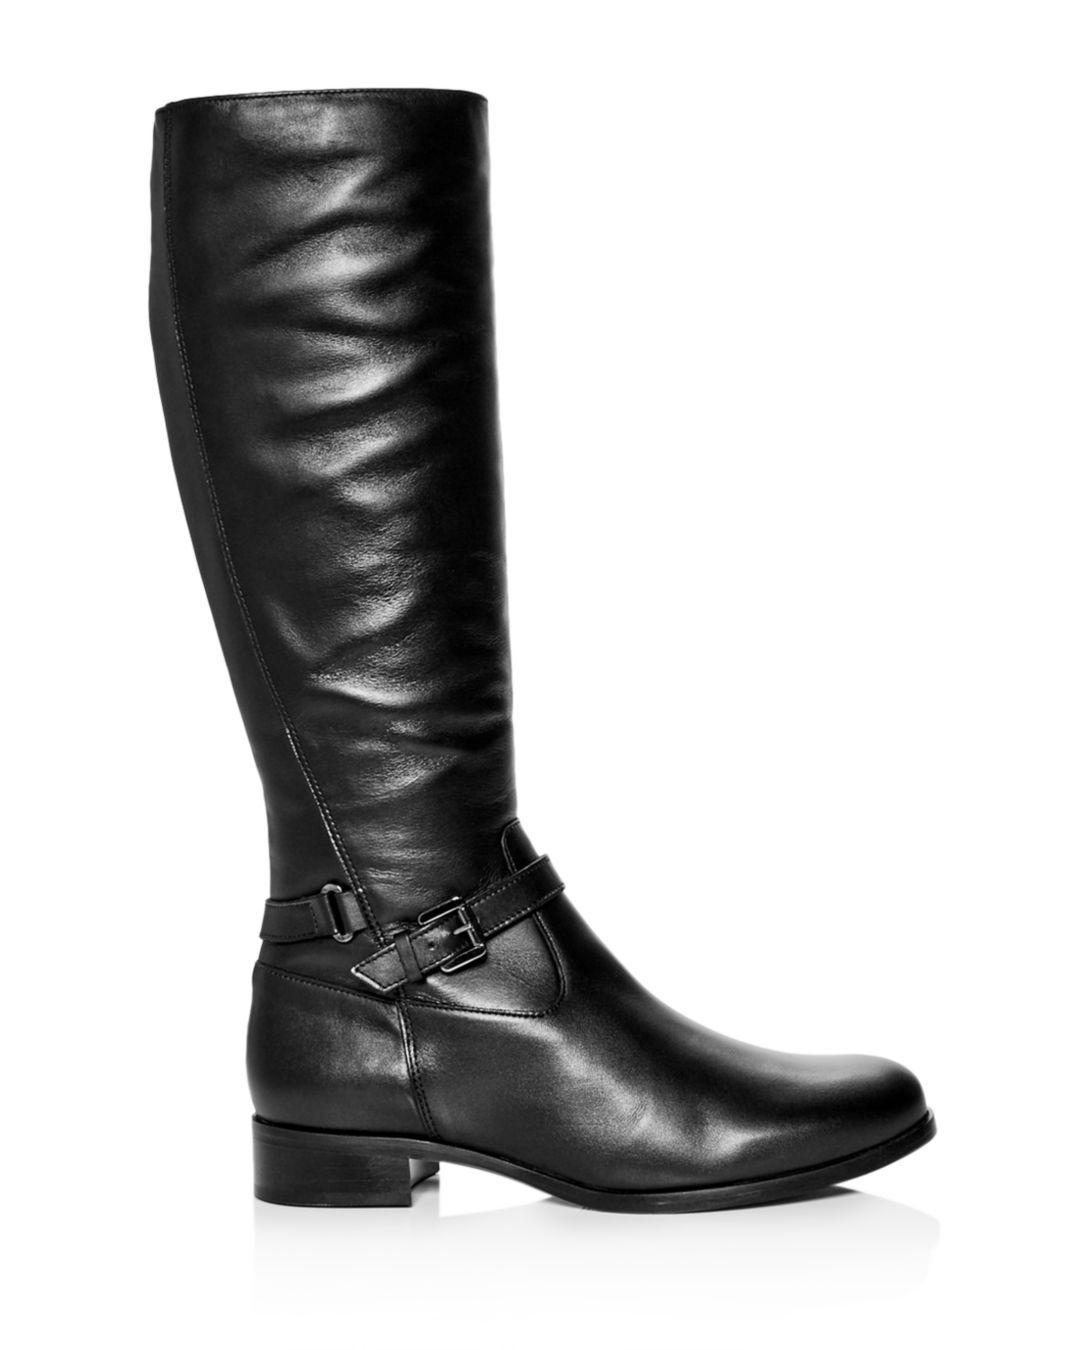 7b6116c371b Lyst - La Canadienne Women s Sunday Waterproof Leather Riding Boots in Black